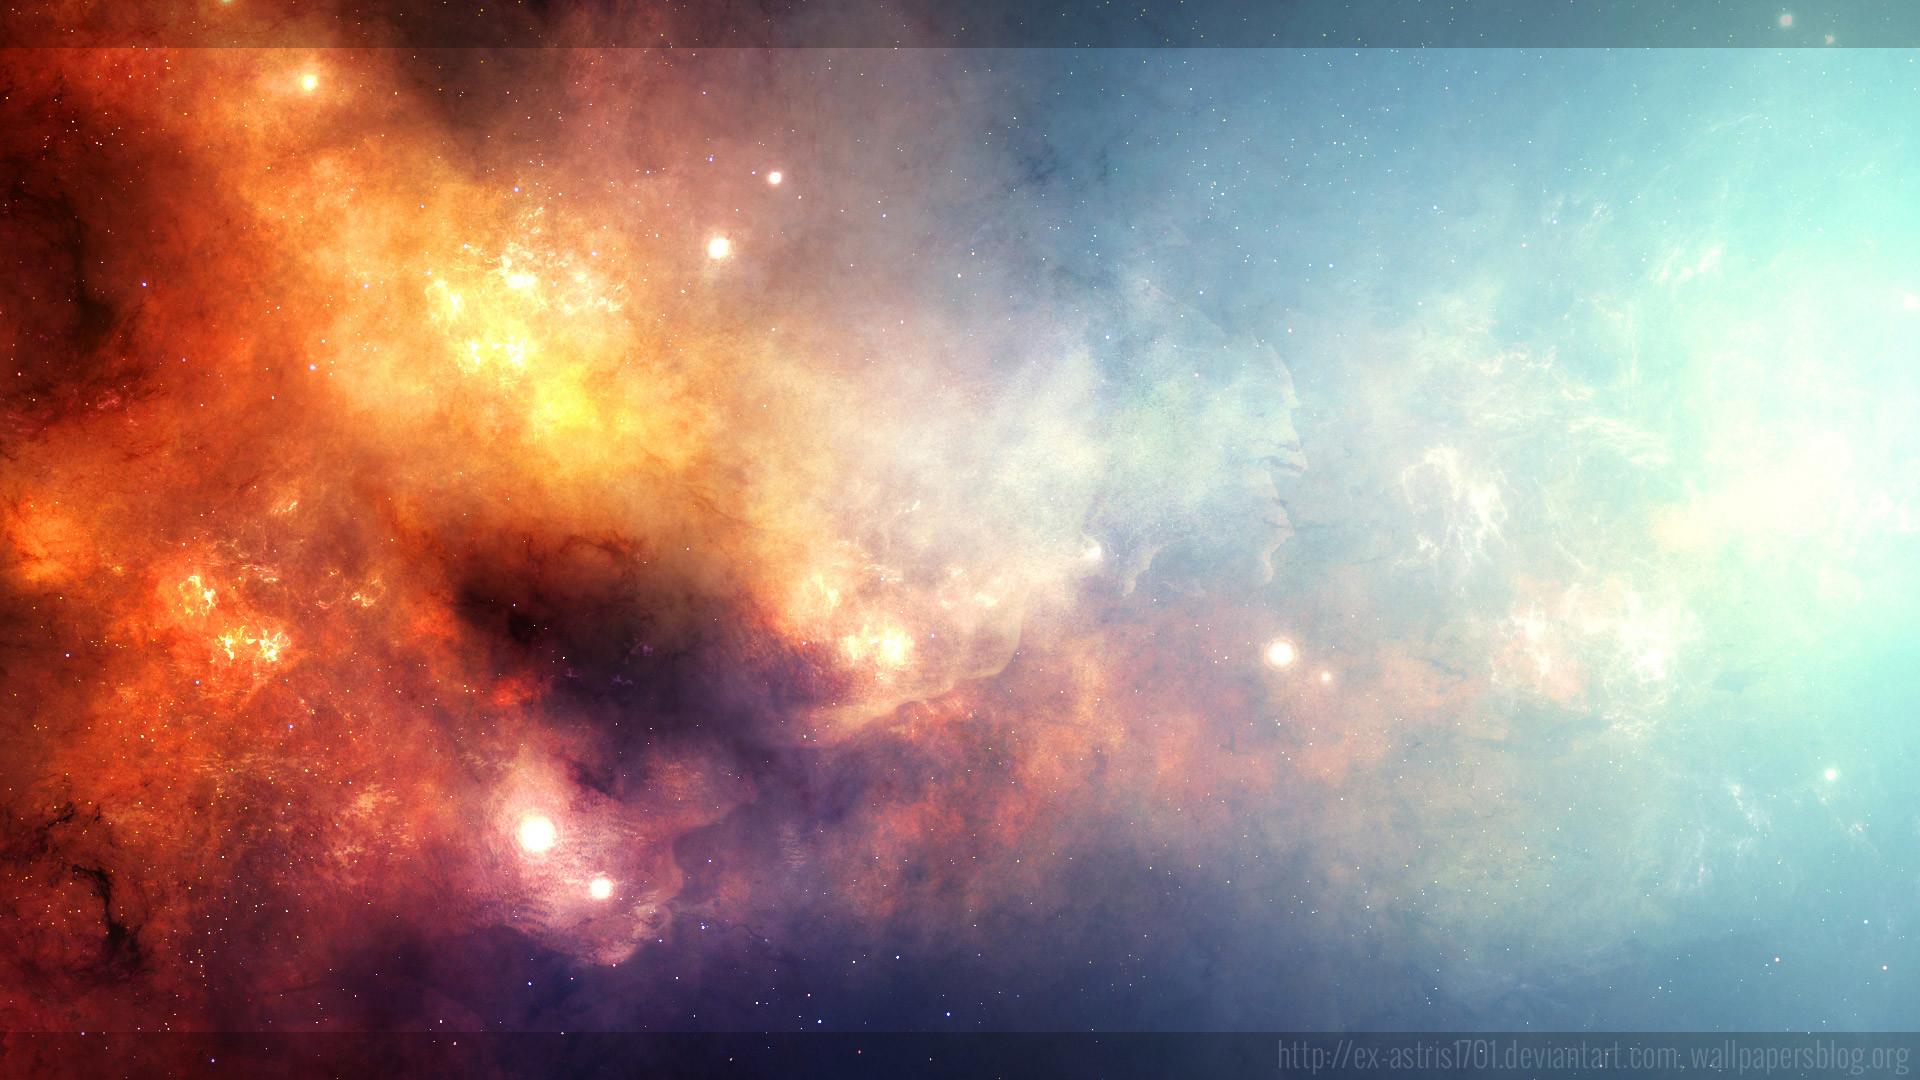 Space   Full HD Wallpapers, download 1080p desktop backgrounds